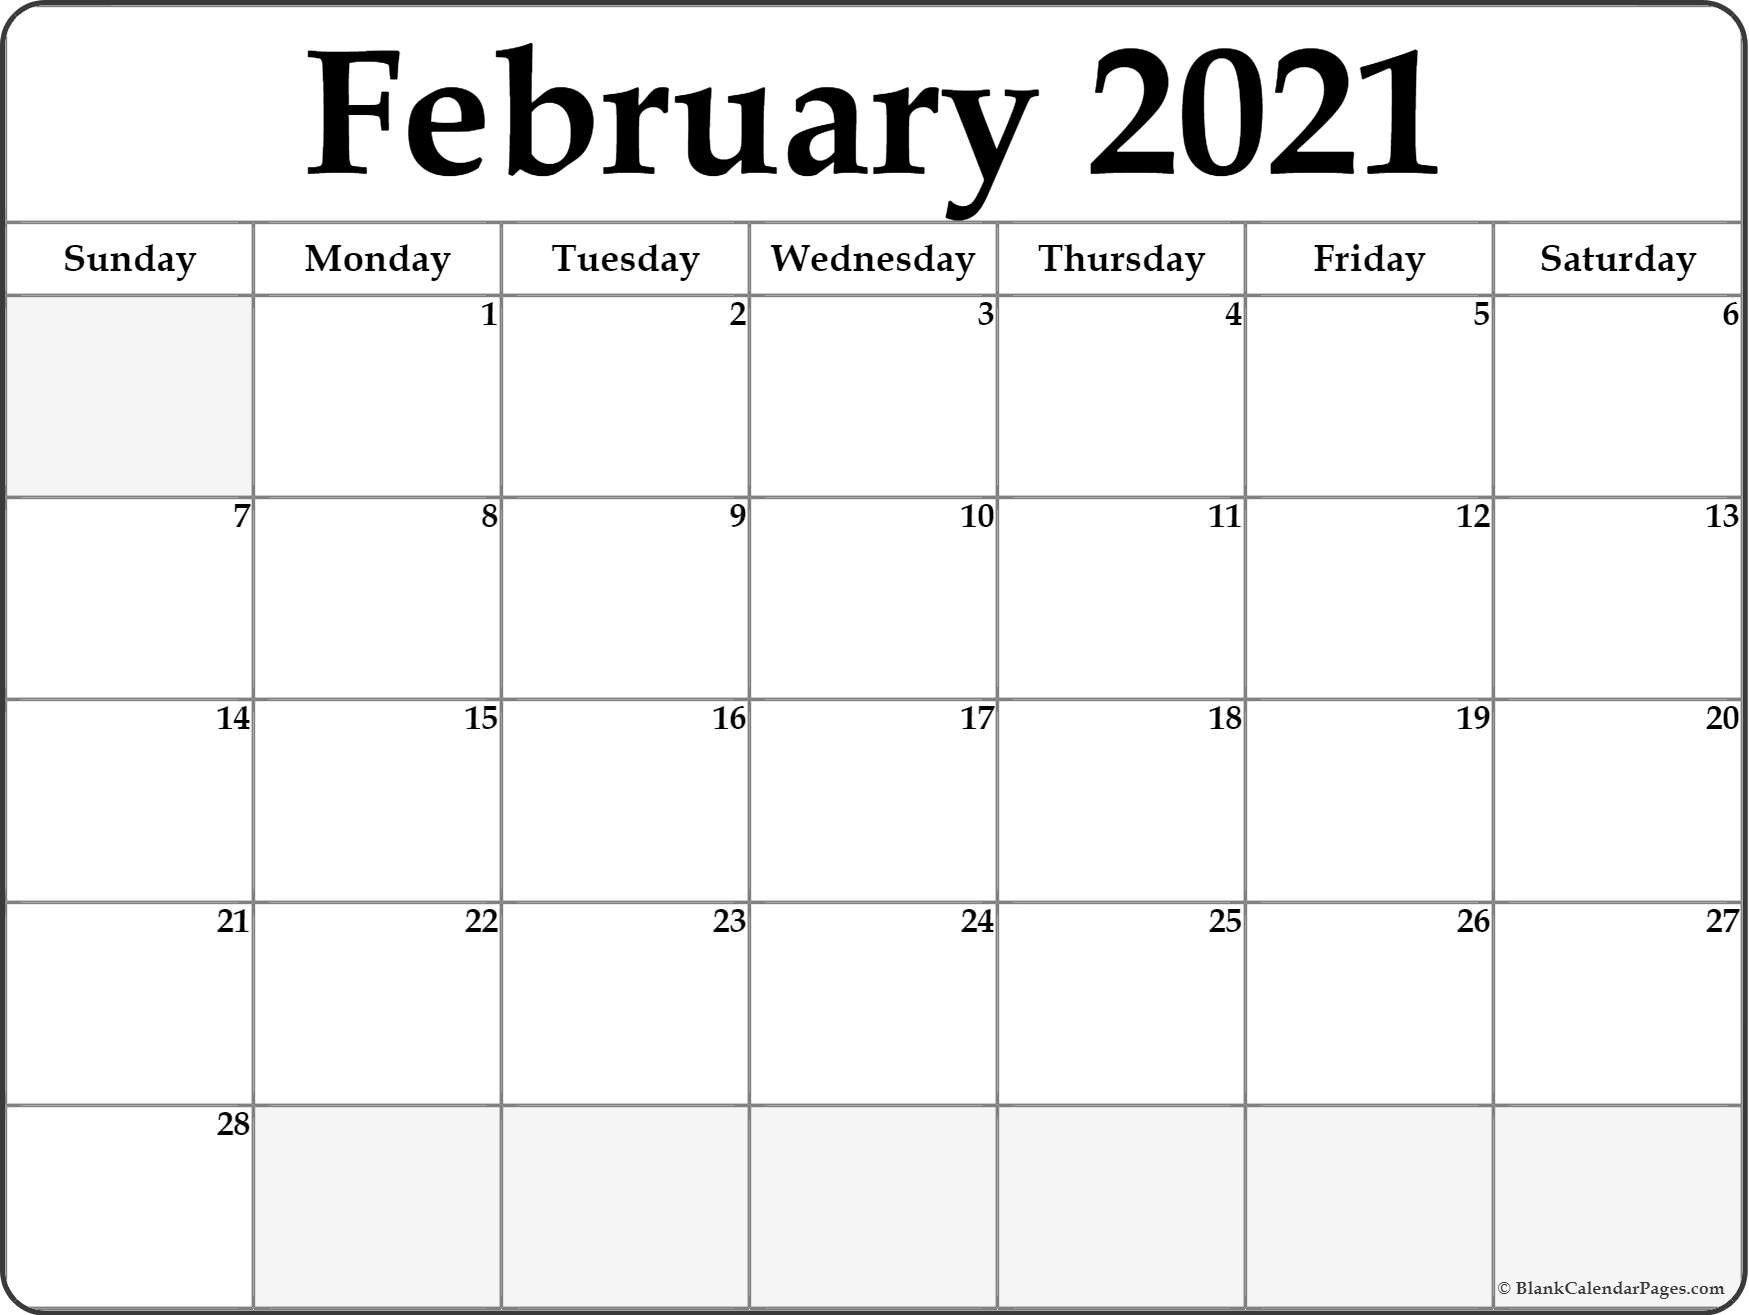 Calendar February 2021 Editable Planner In 2020 | February Printable 3 Months At A Time Calendar 2021